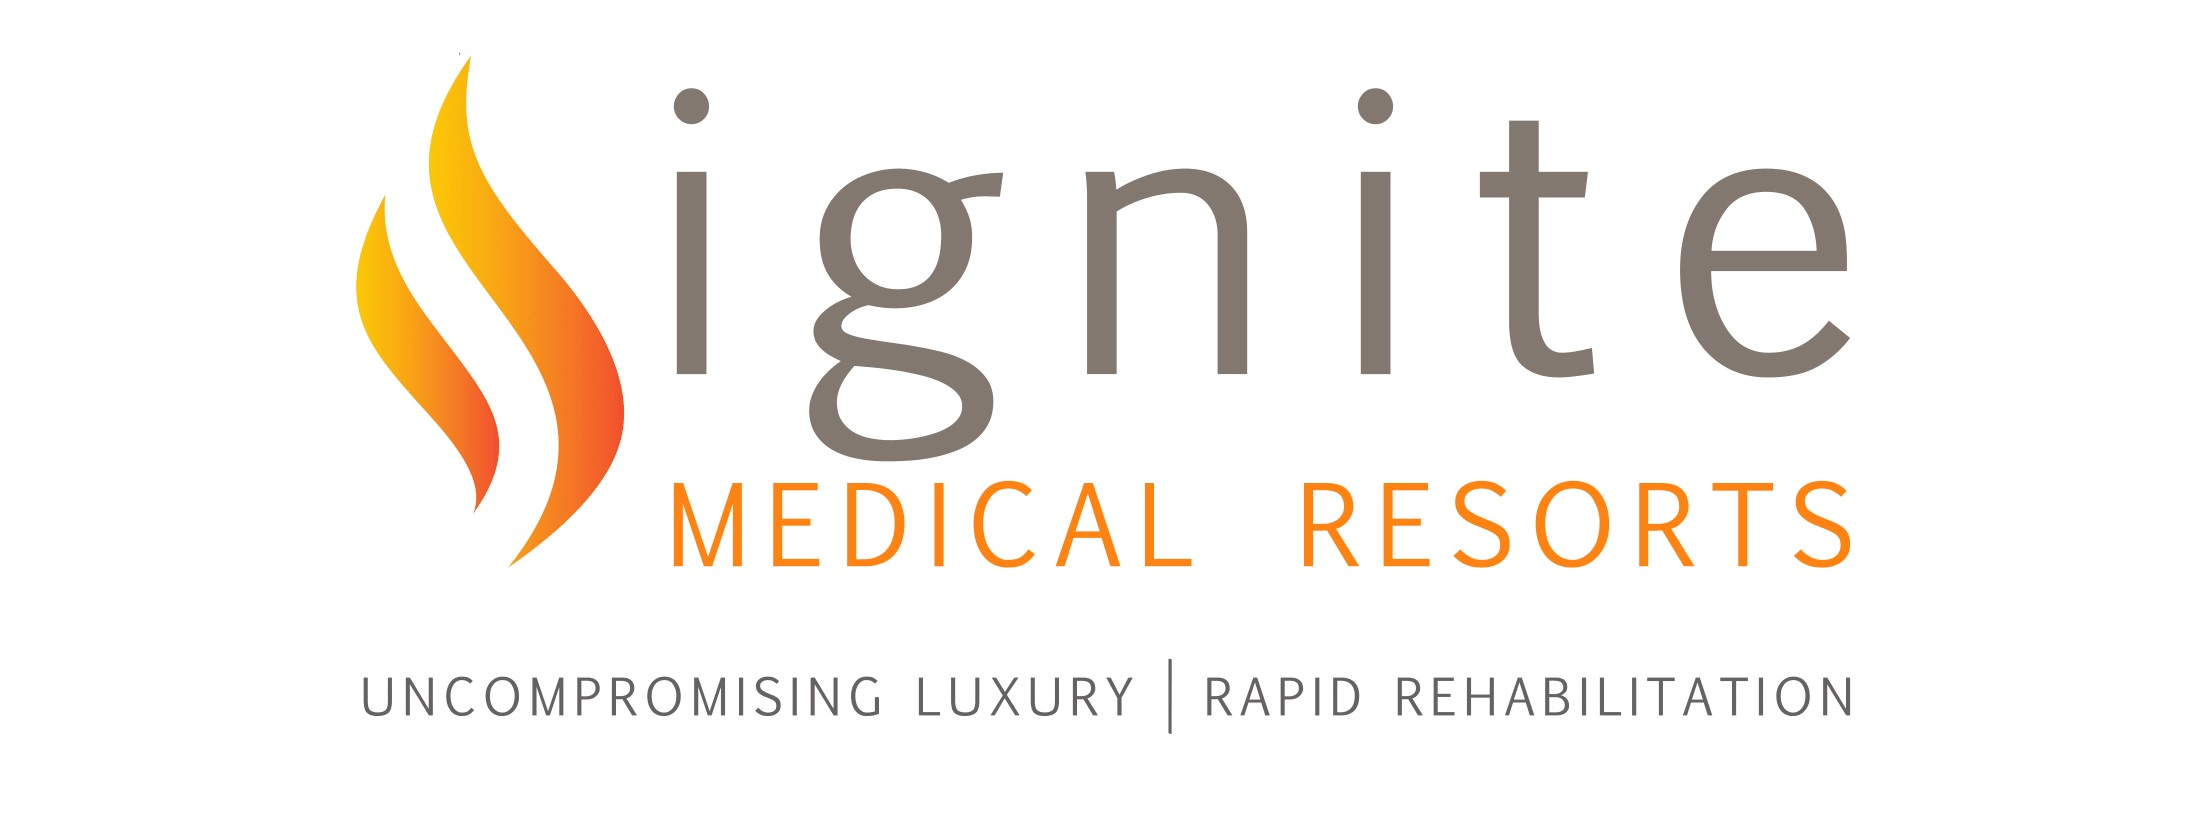 Ignite Medical Resorts